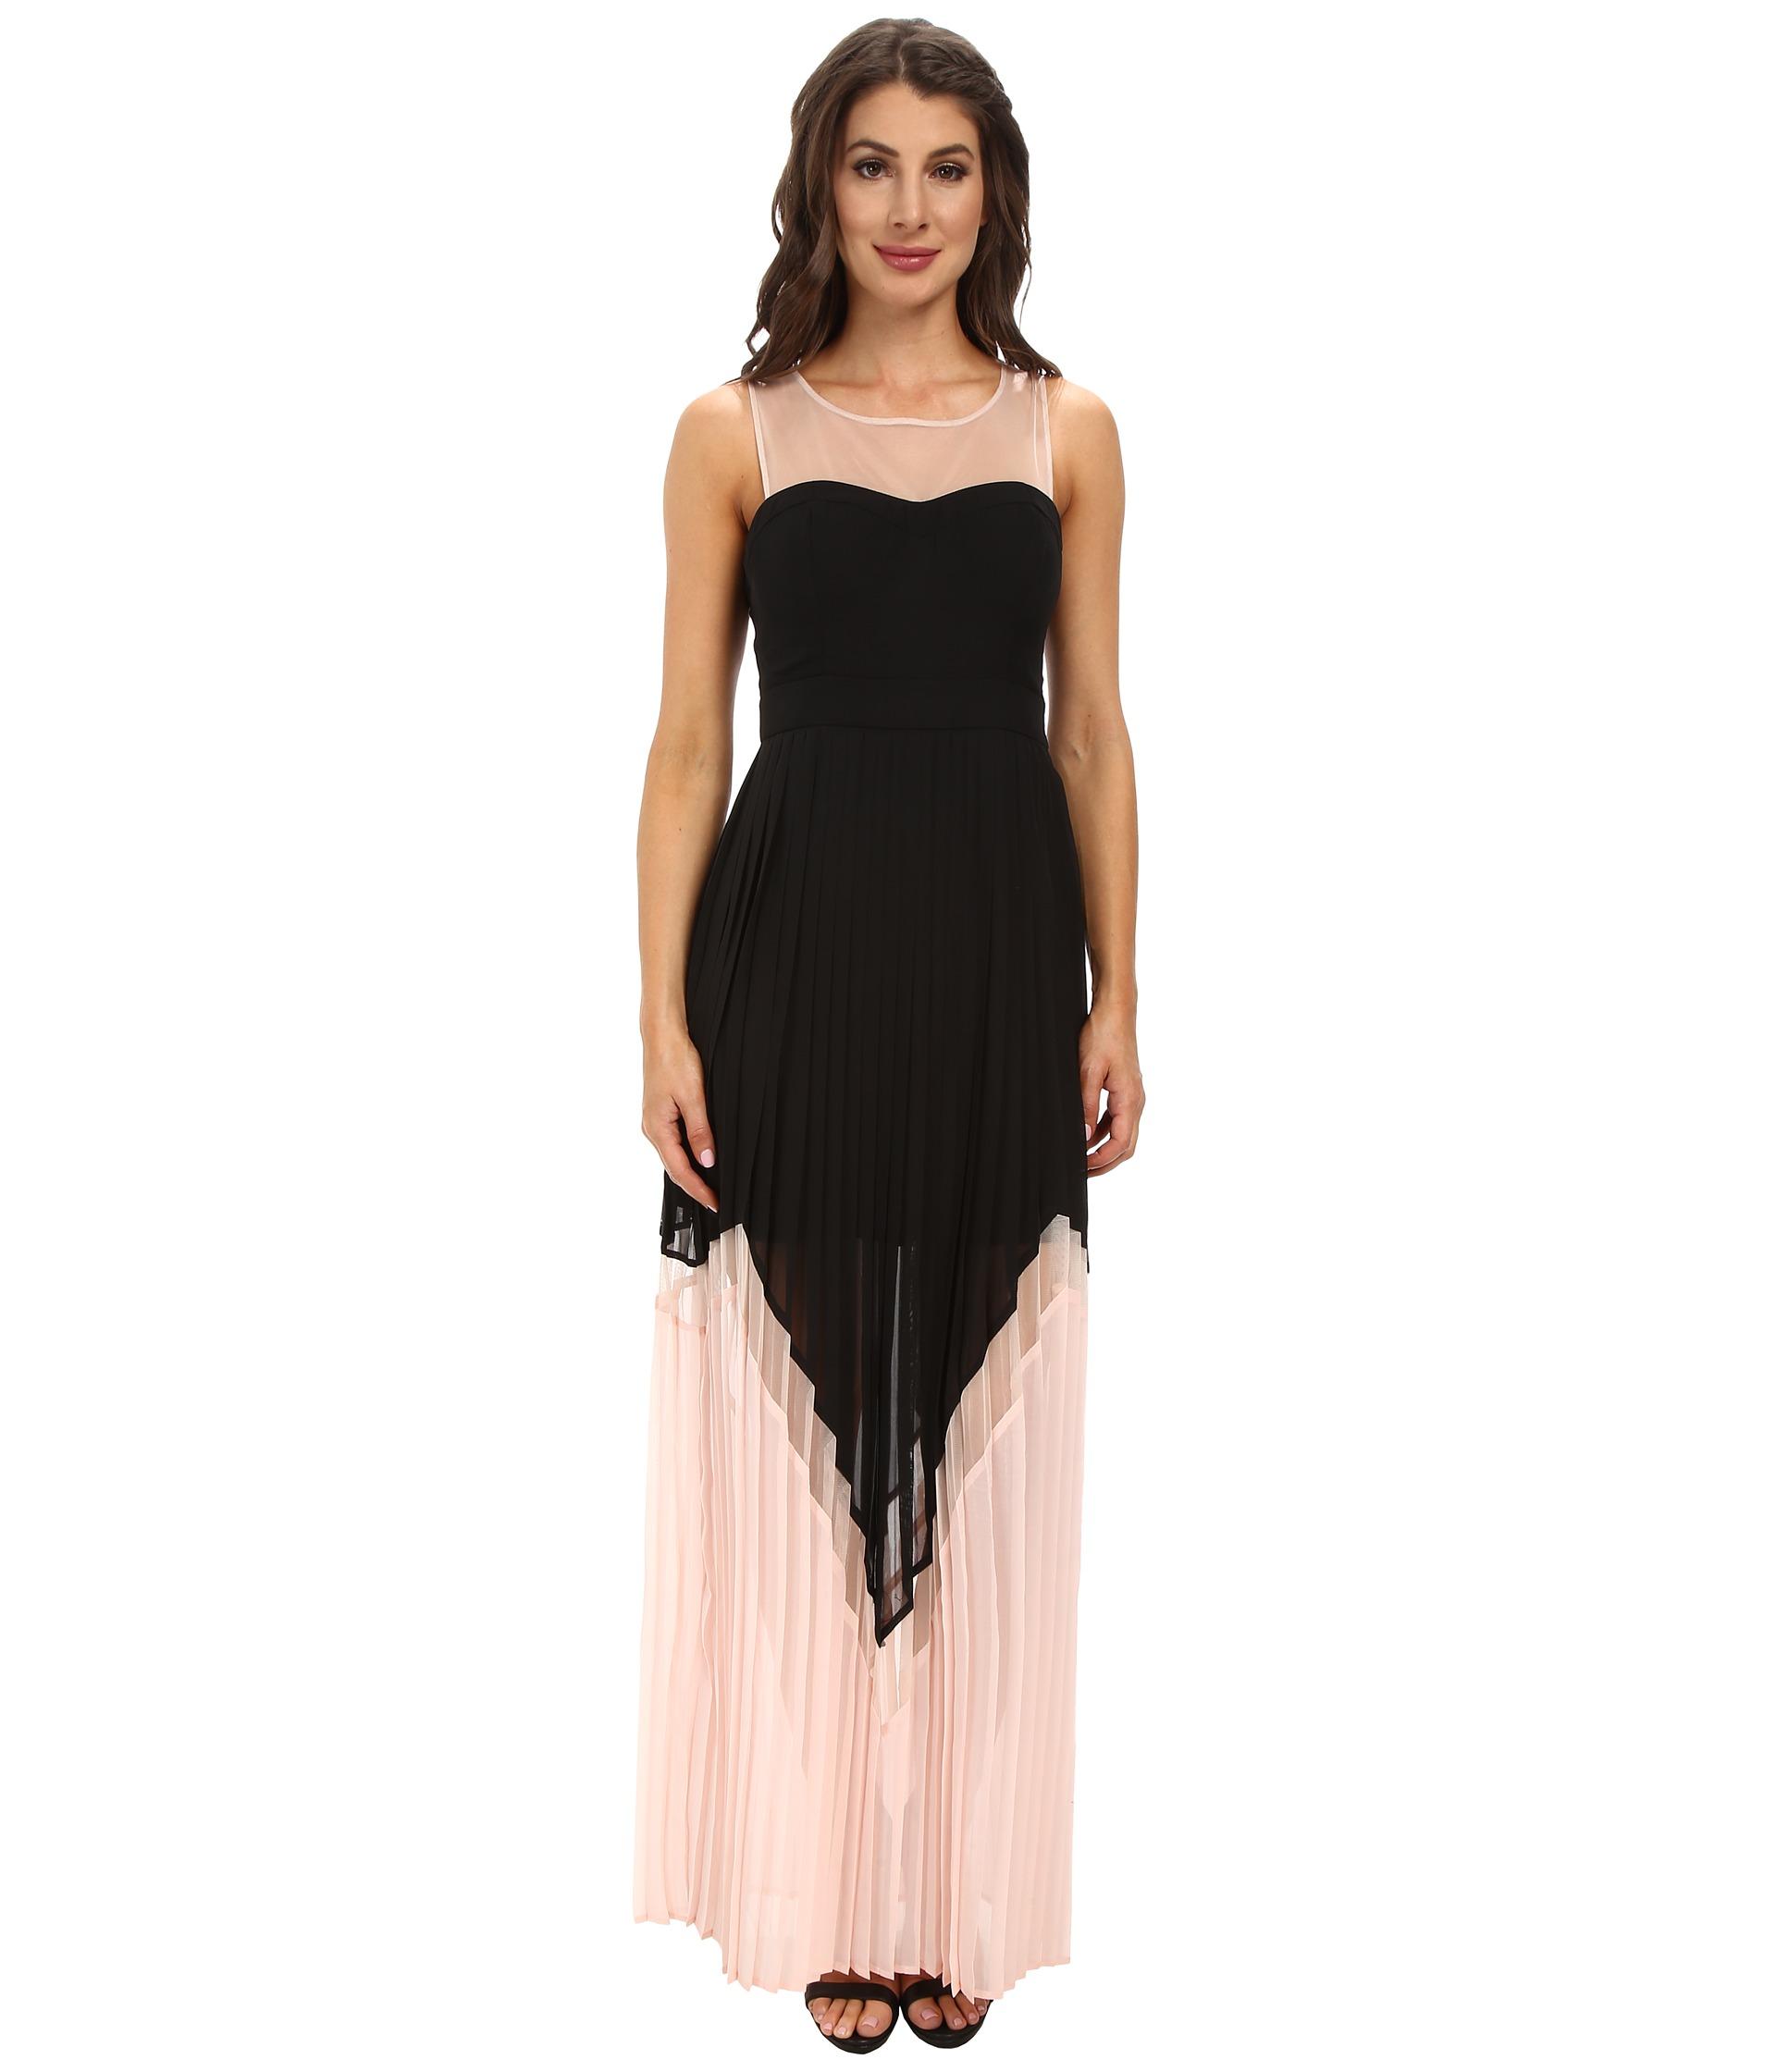 NOTICIAS: Plus size dresses Belk